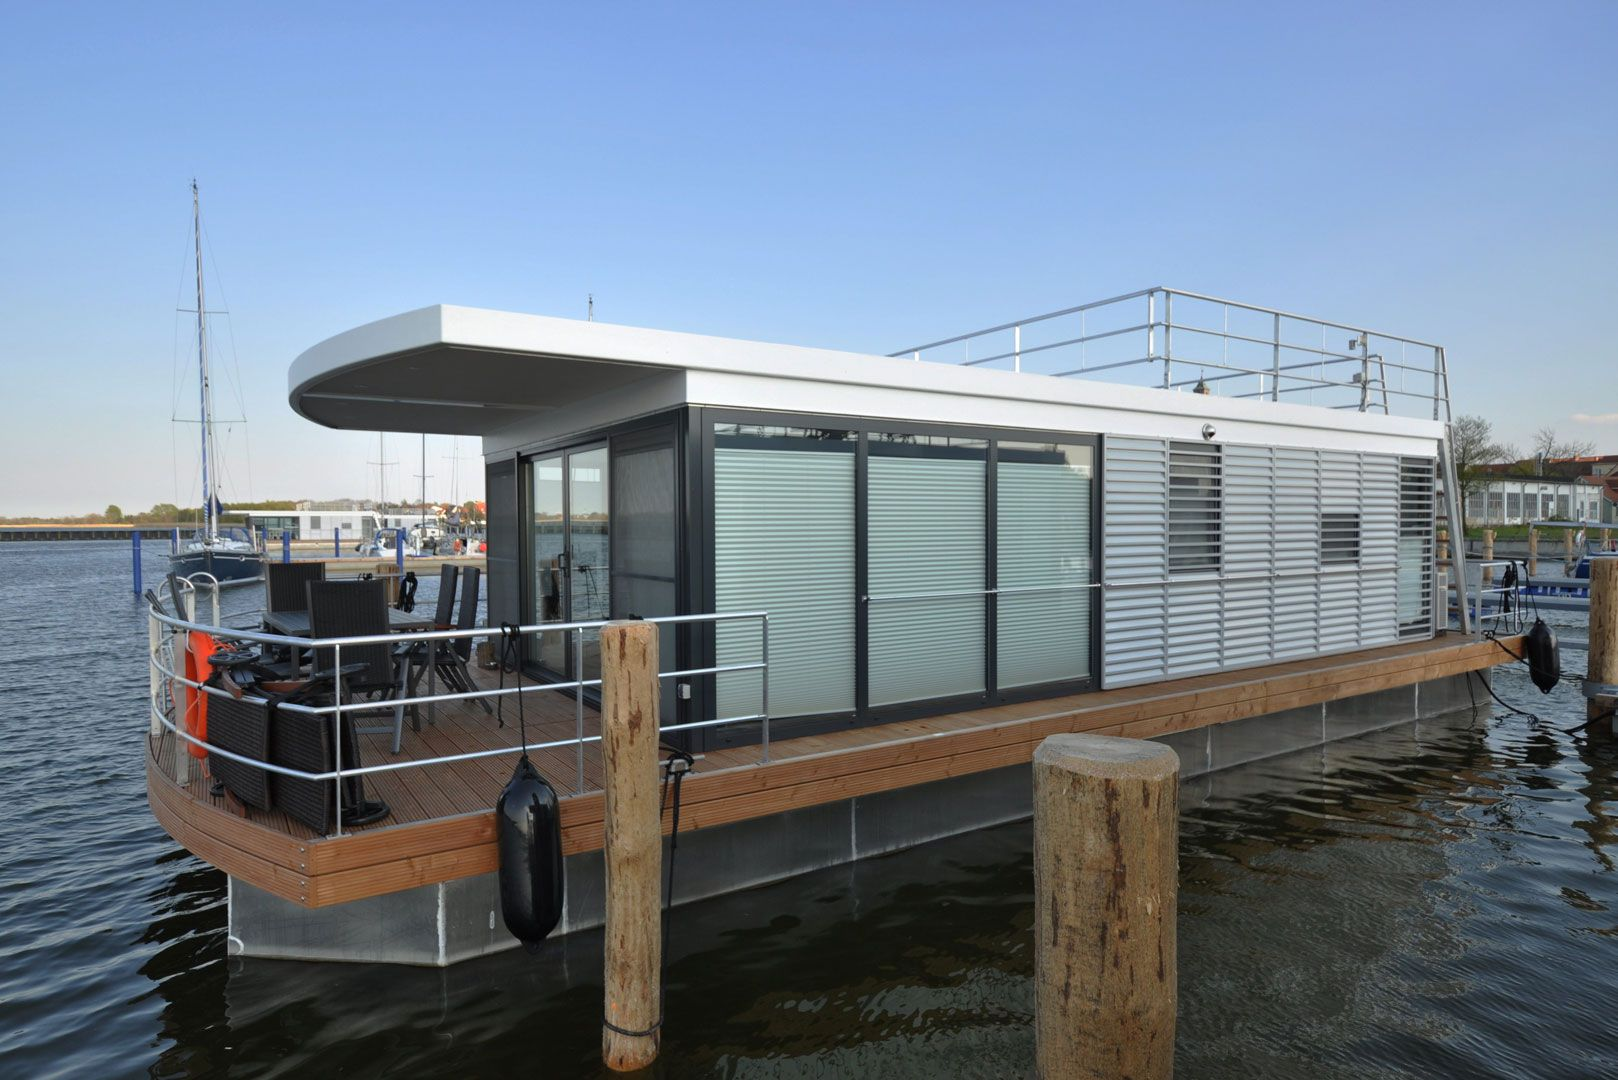 Hausboot Mieten Darss Ribnitz Damgarten Marie Mit Bildern Hausboot Hausboot Mieten Ostsee Ferienwohnung